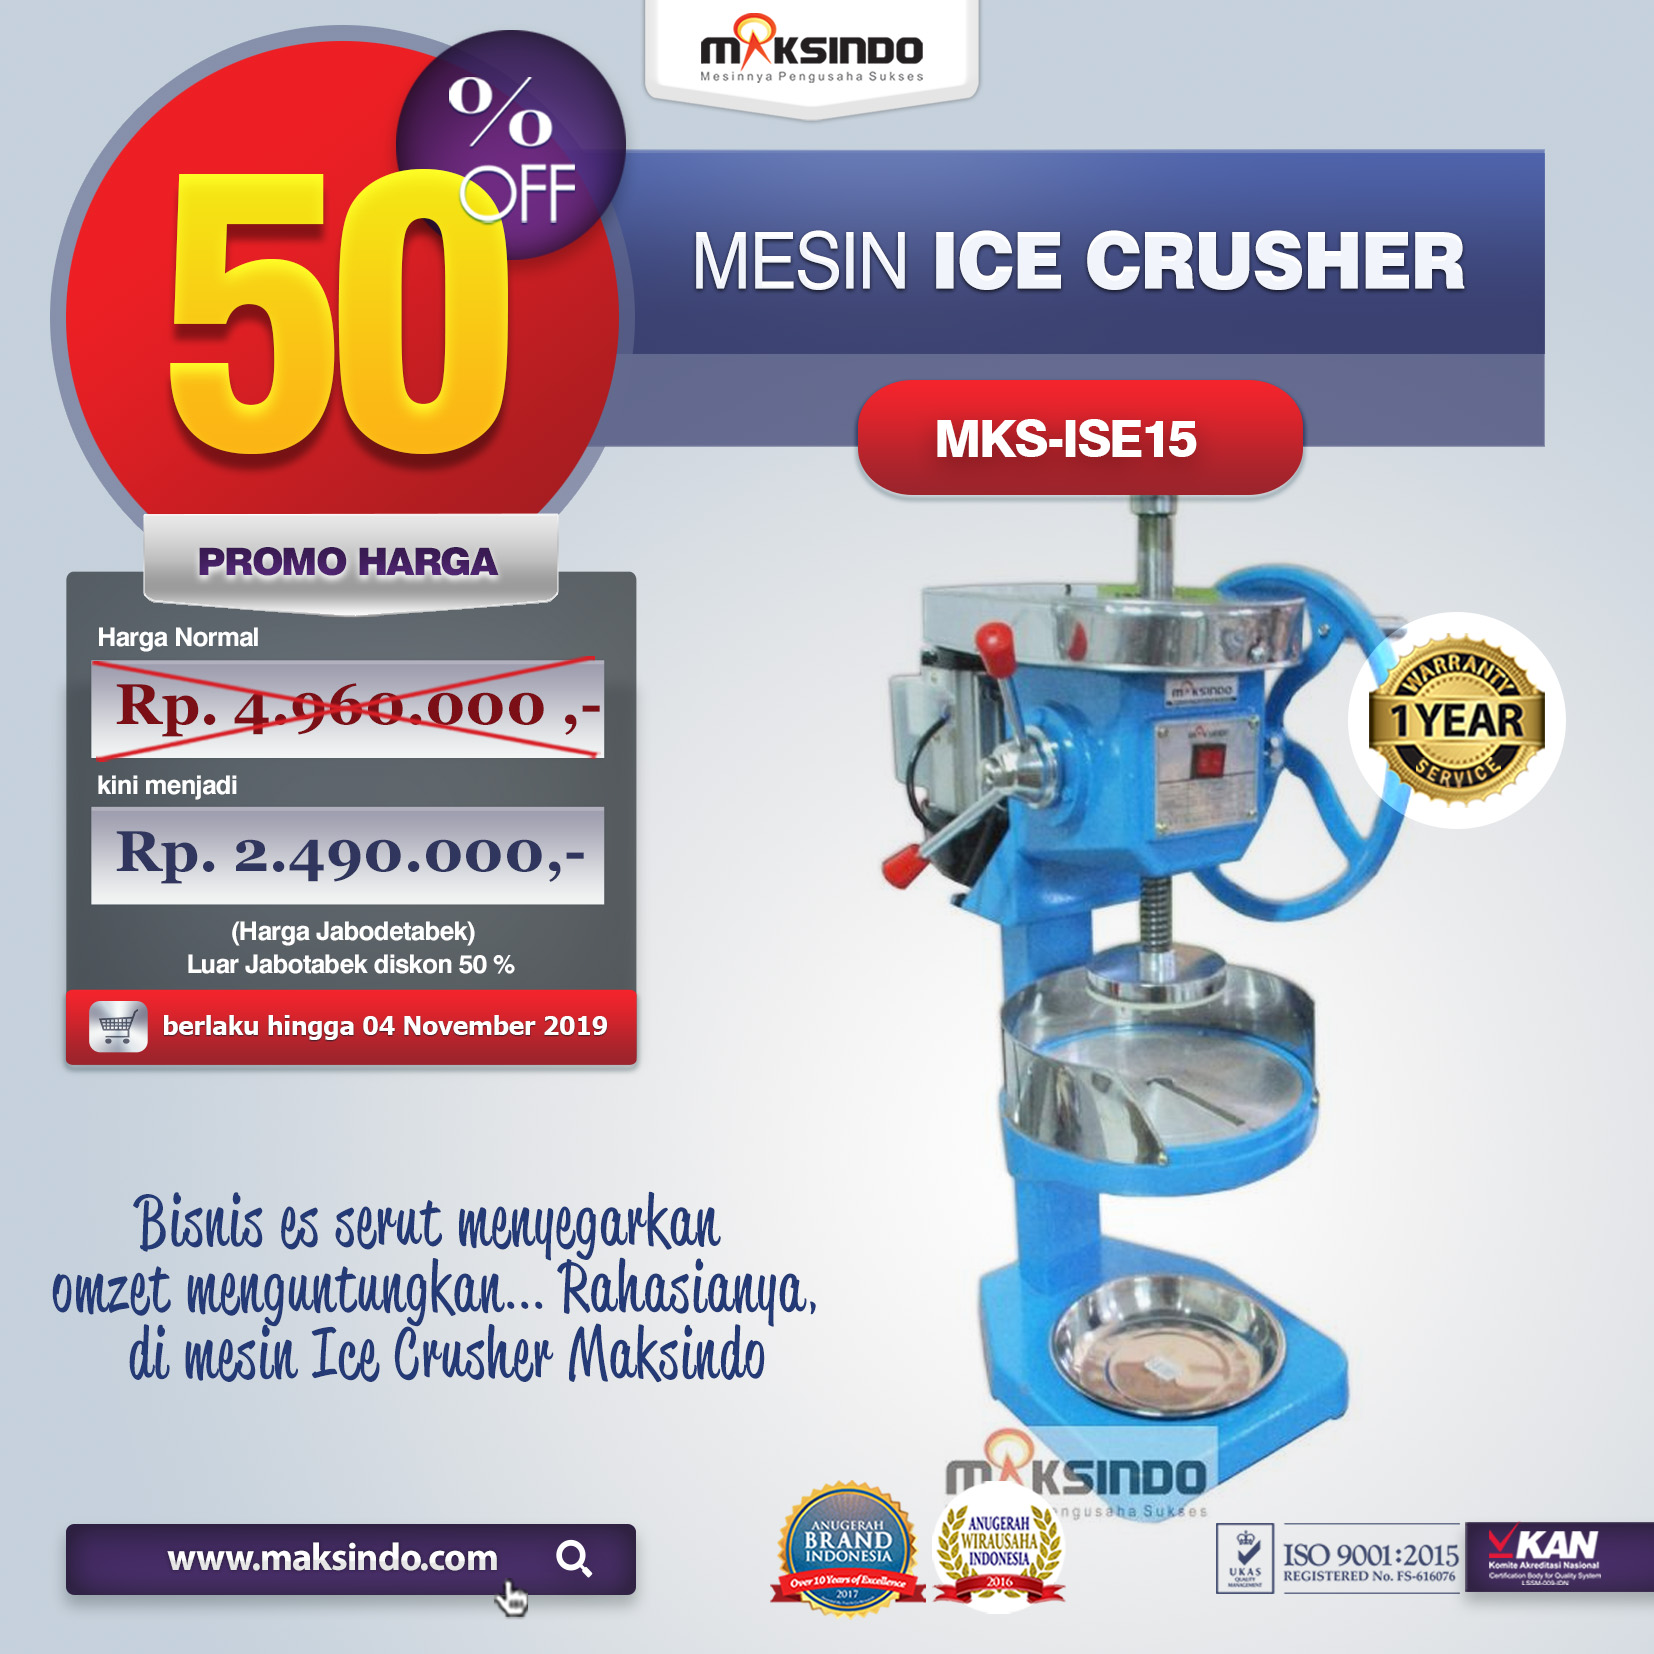 MKS ISE15 mesin ice crusher